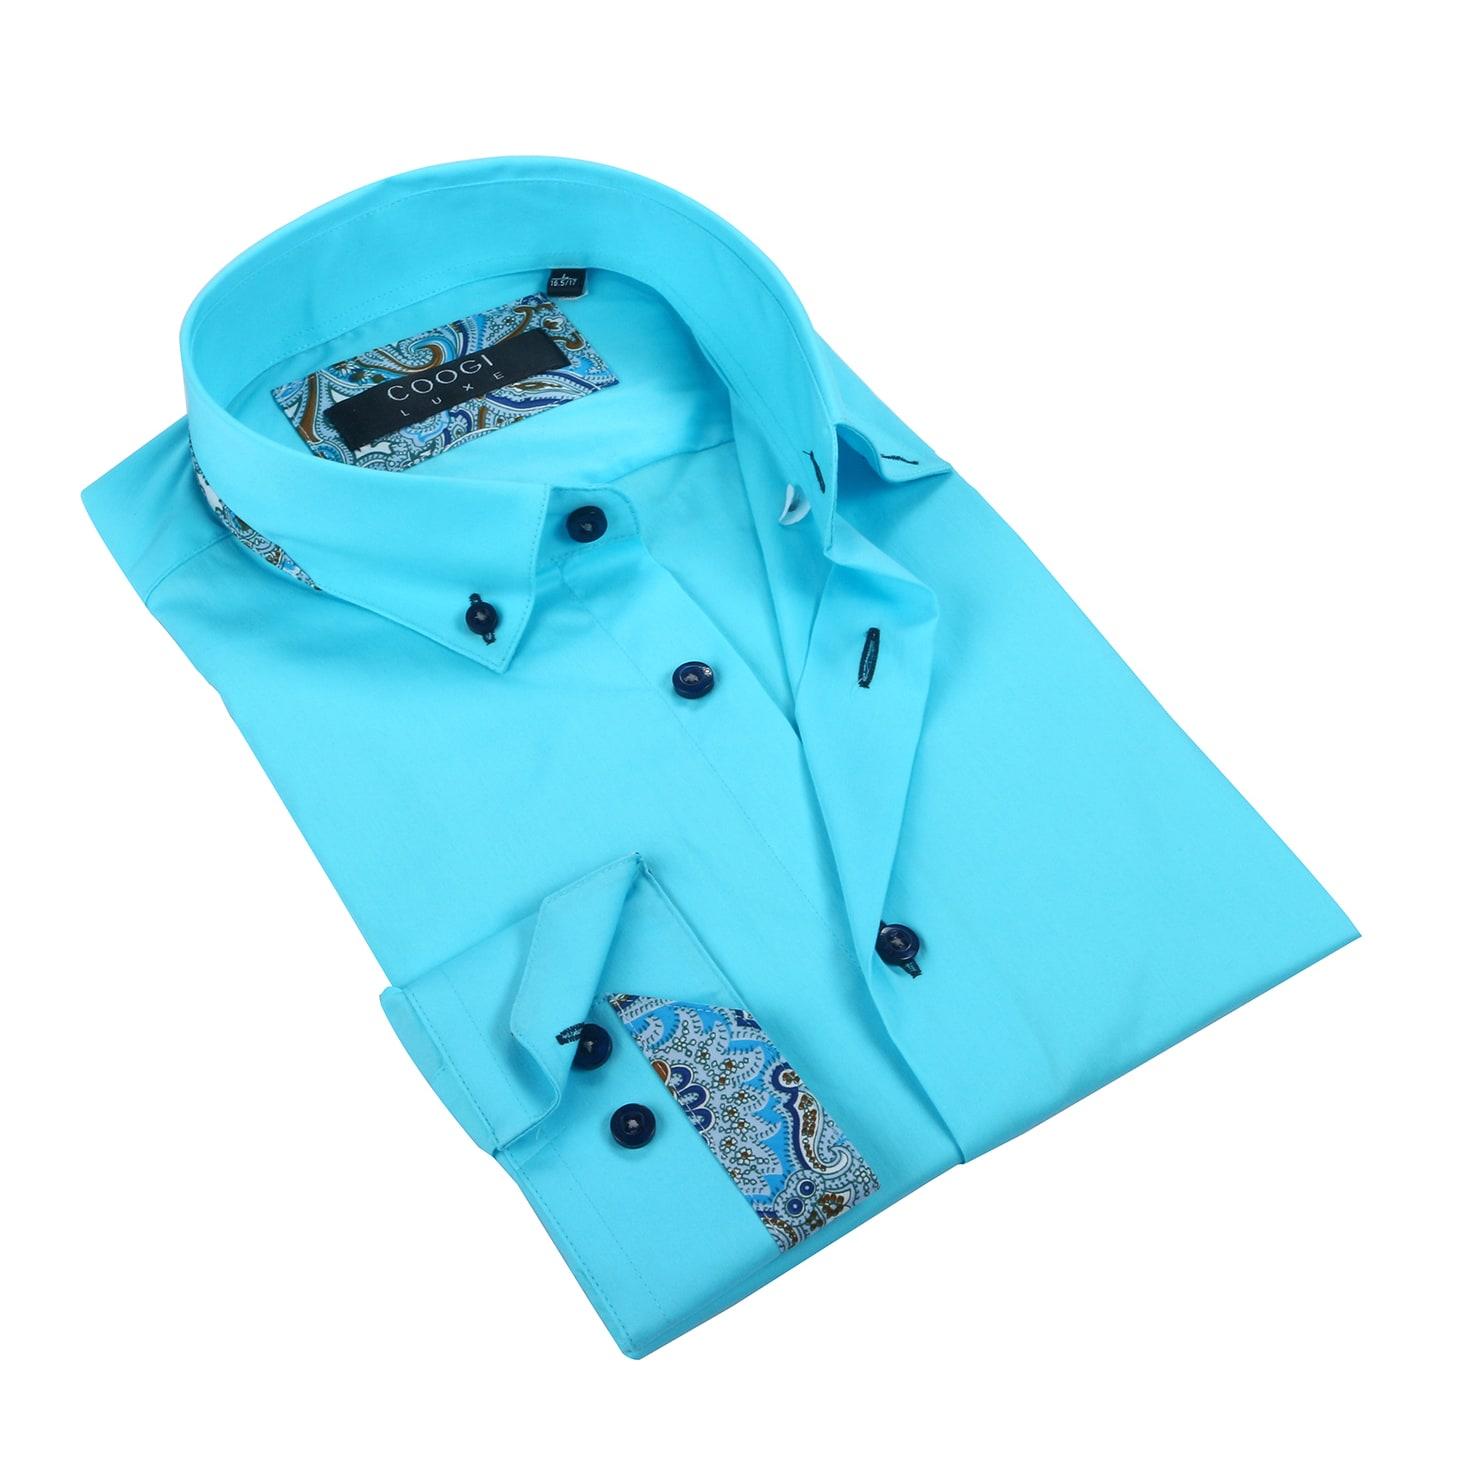 Coogi Luxe 100% Cotton Teal (Blue) Dress Shirt w/Paisley ...